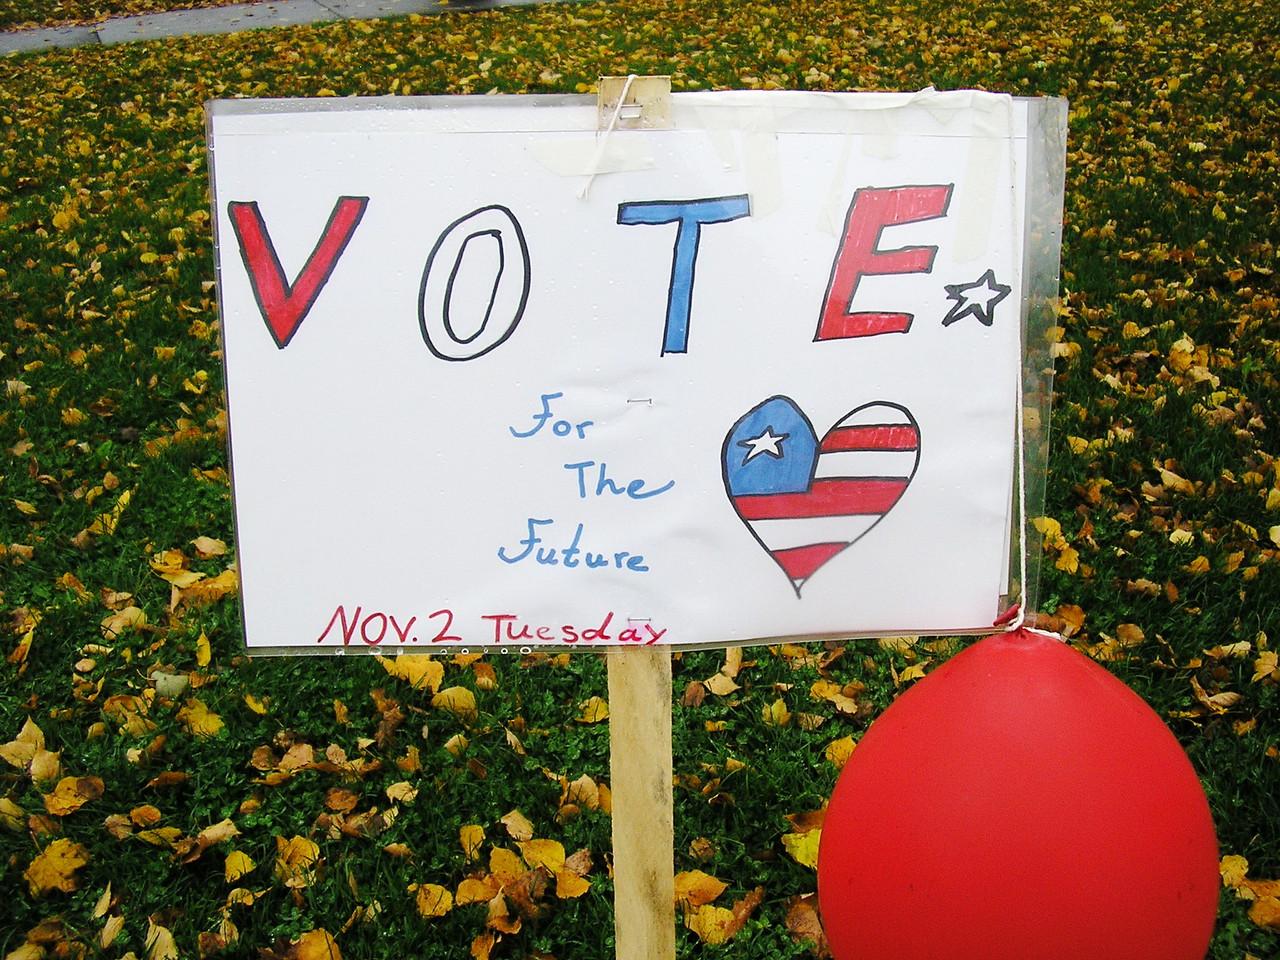 """VOTE for the Future, Nov. 2, Tuesday"""